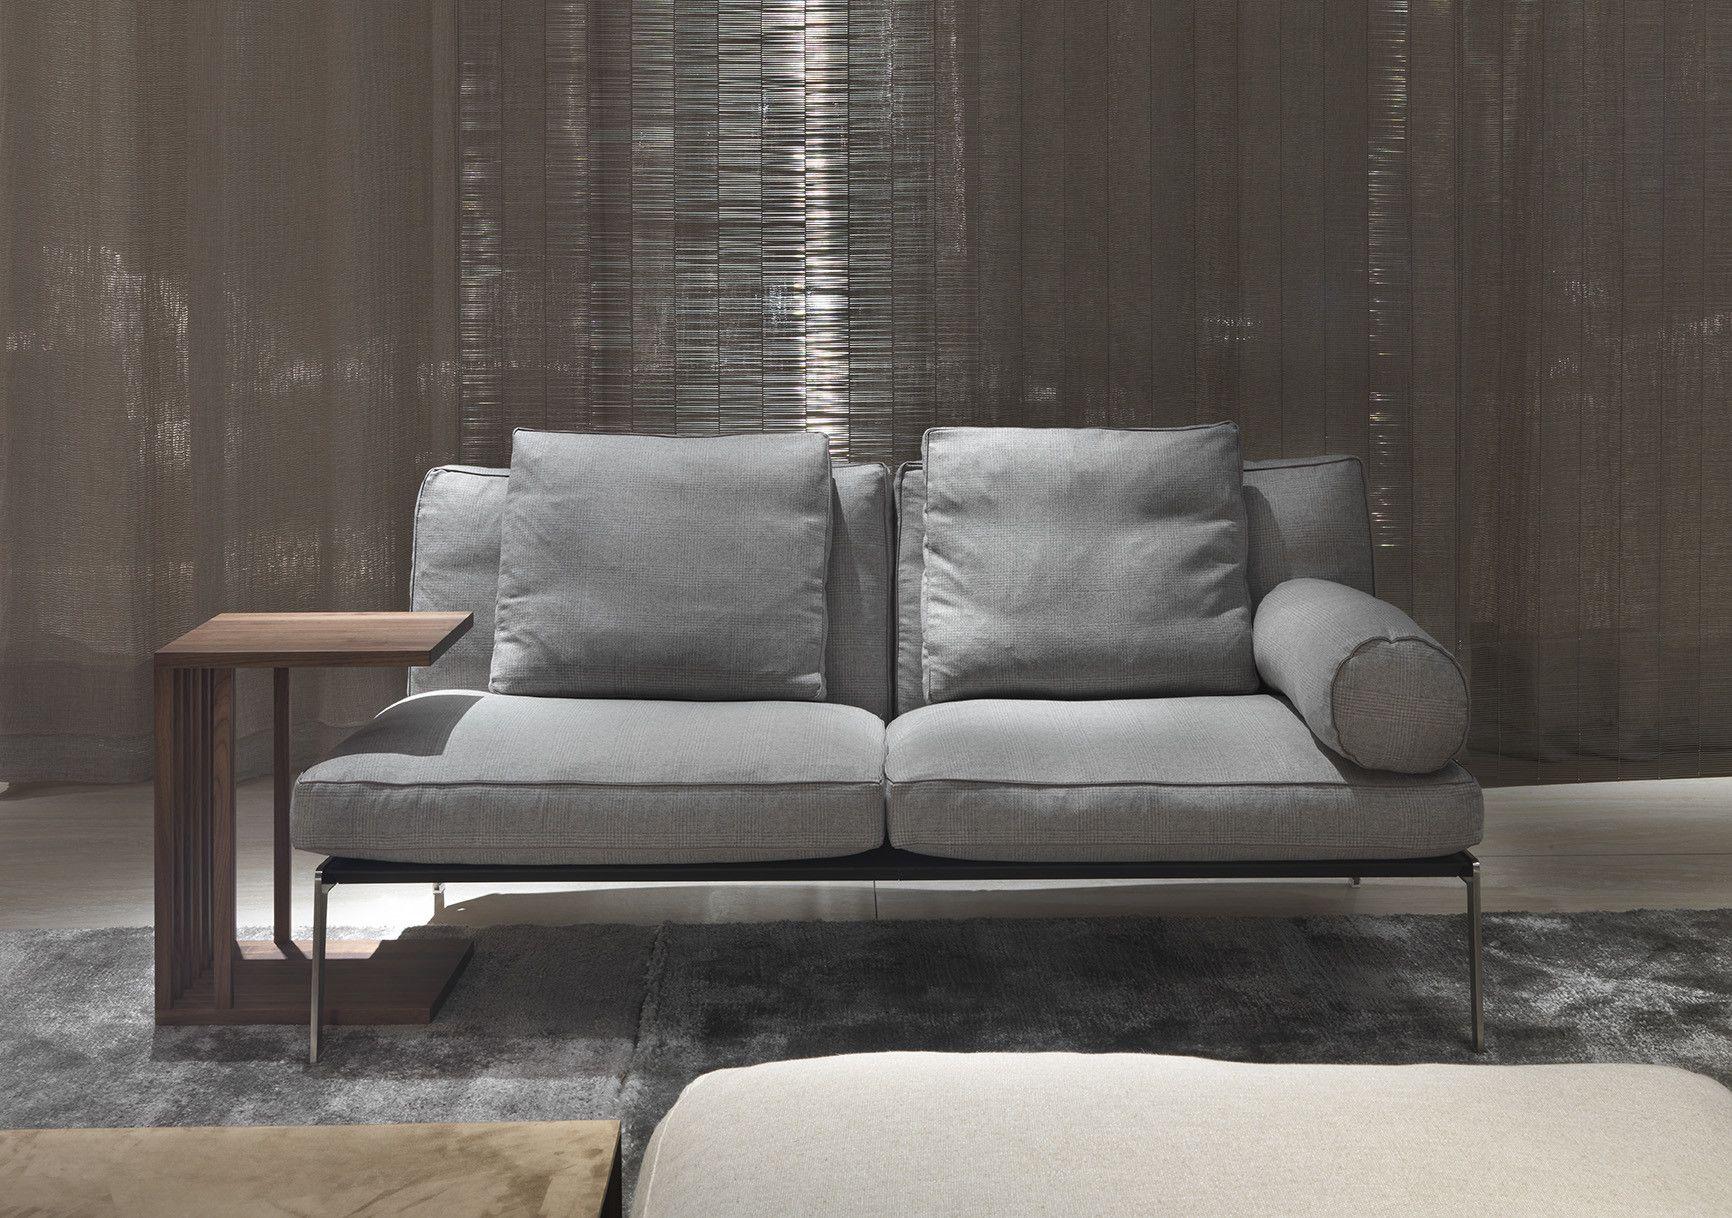 Enjoyable Flexform 2015 Citterio Sofa Armchair Happy Flexform Sofa Dailytribune Chair Design For Home Dailytribuneorg